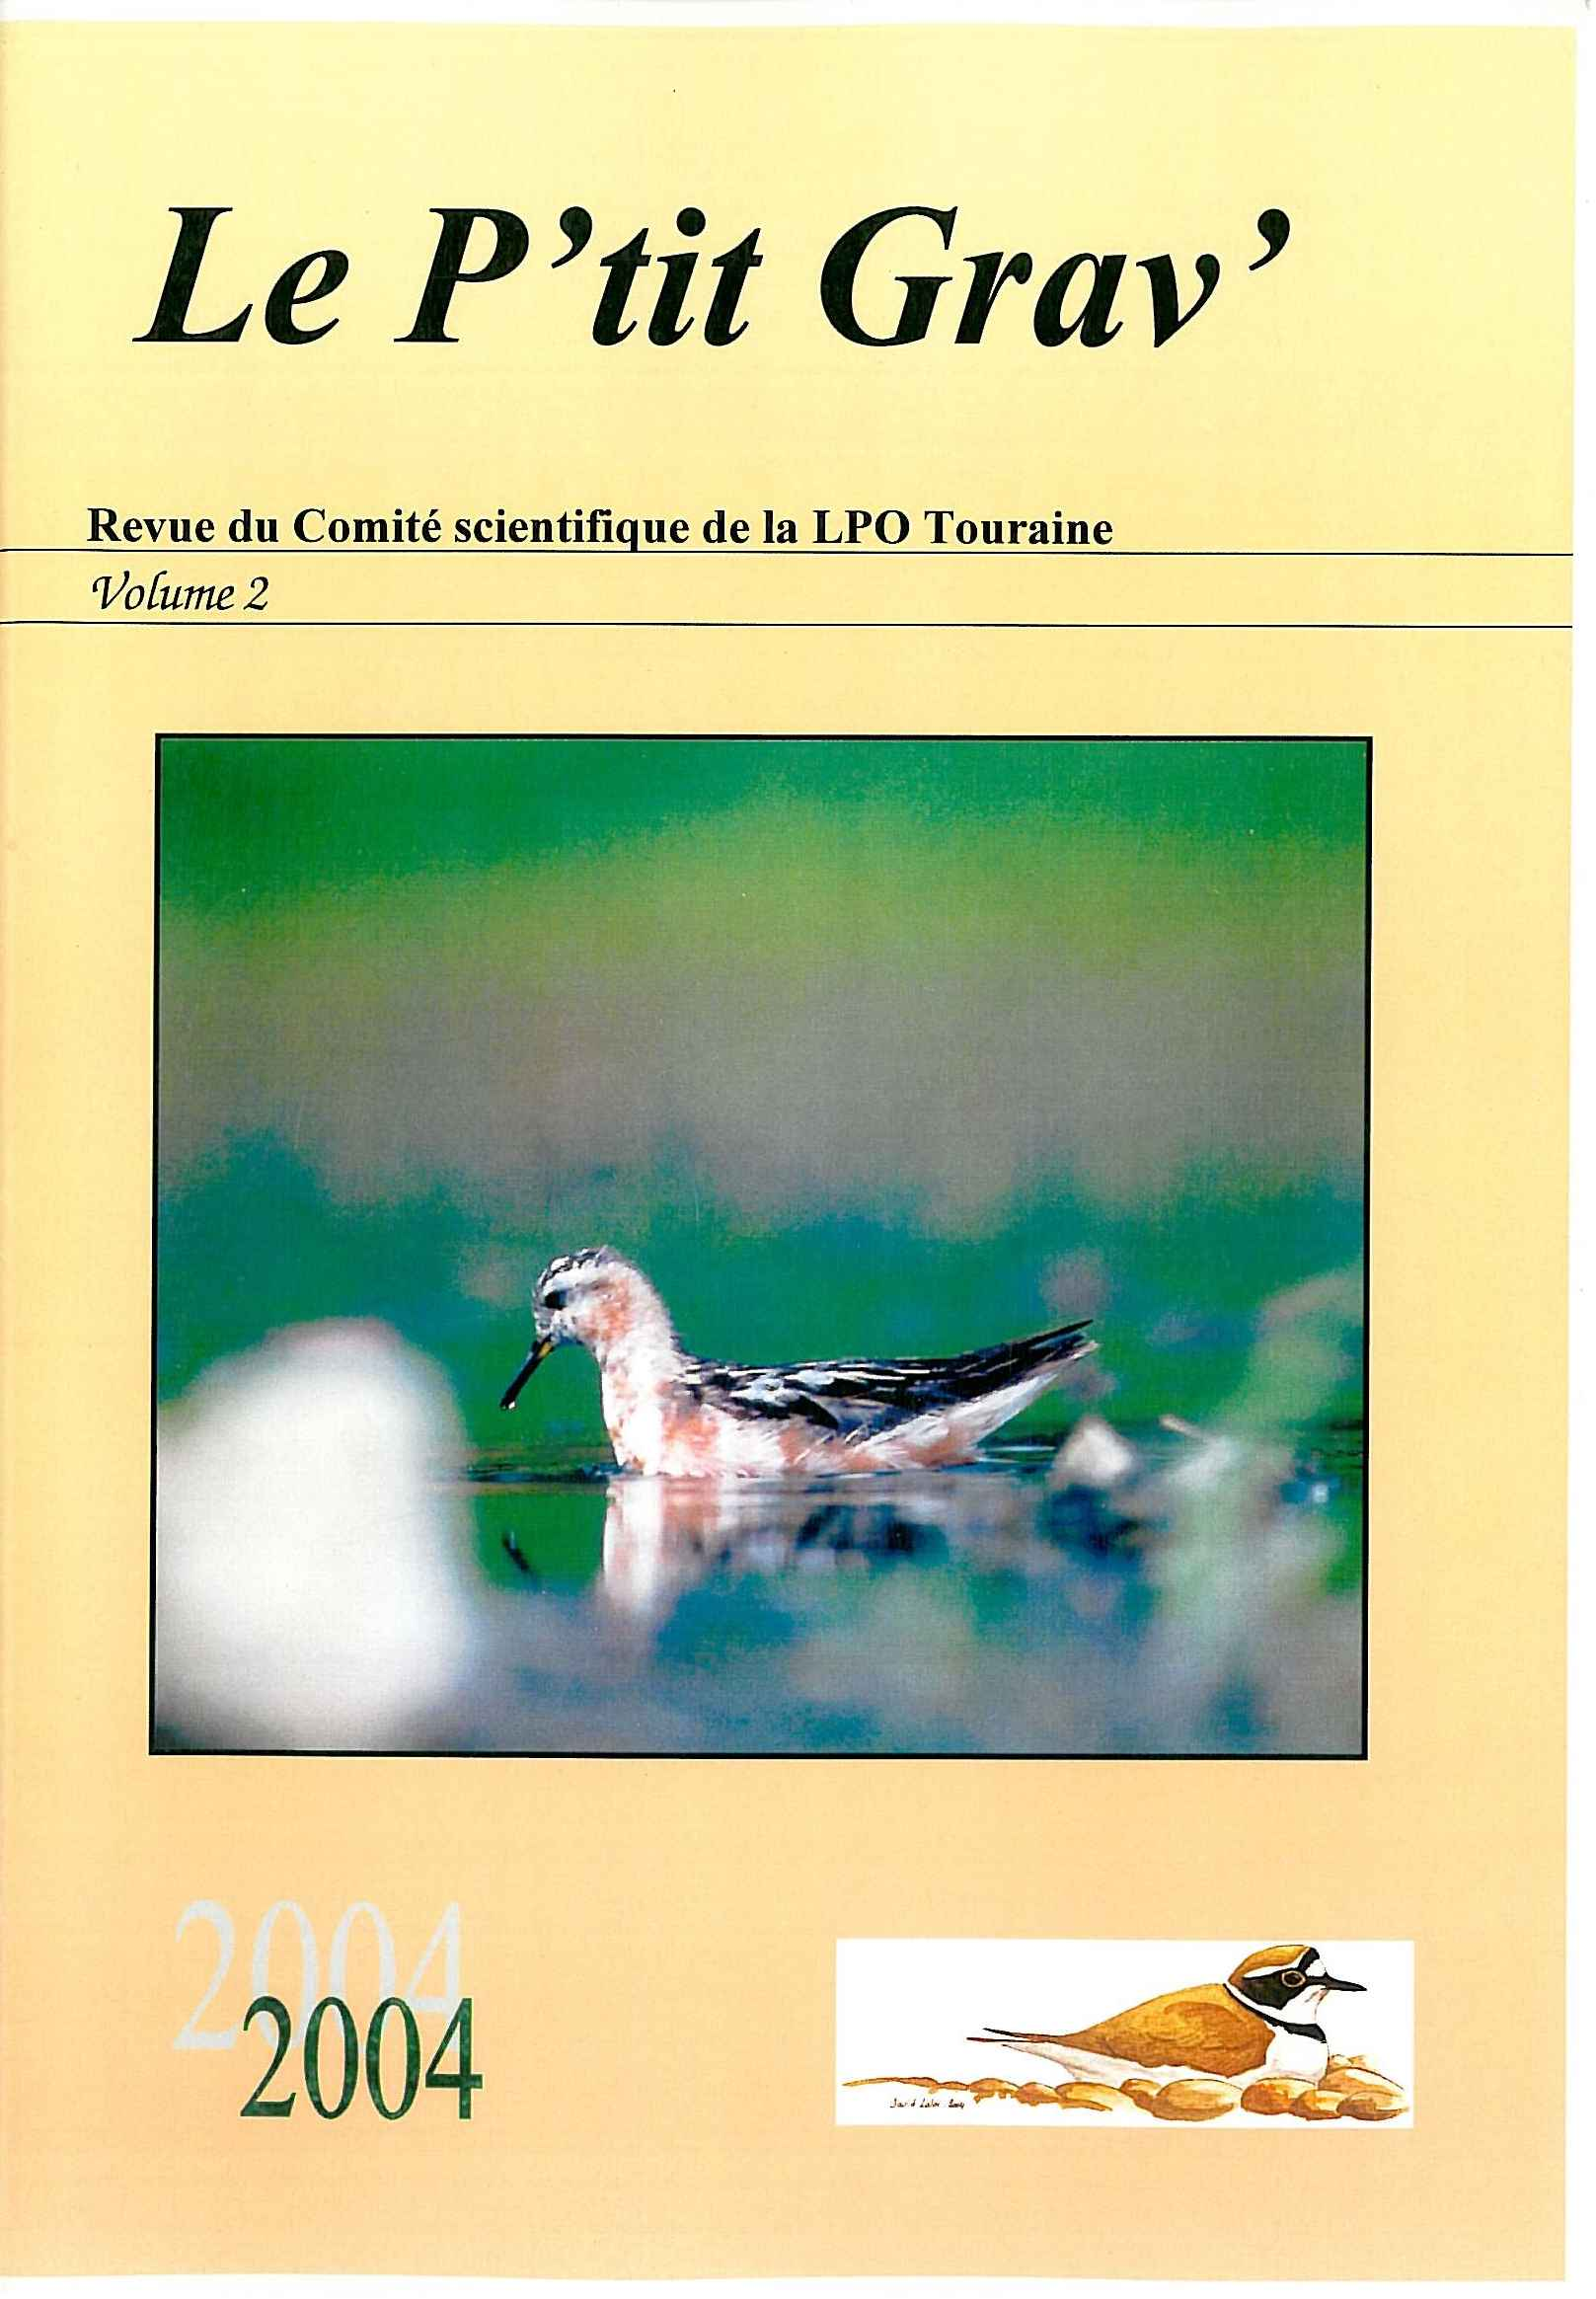 https://cdnfiles2.biolovision.net/www.faune-touraine.org/userfiles/MonDossier/PtitGravvol2.jpg